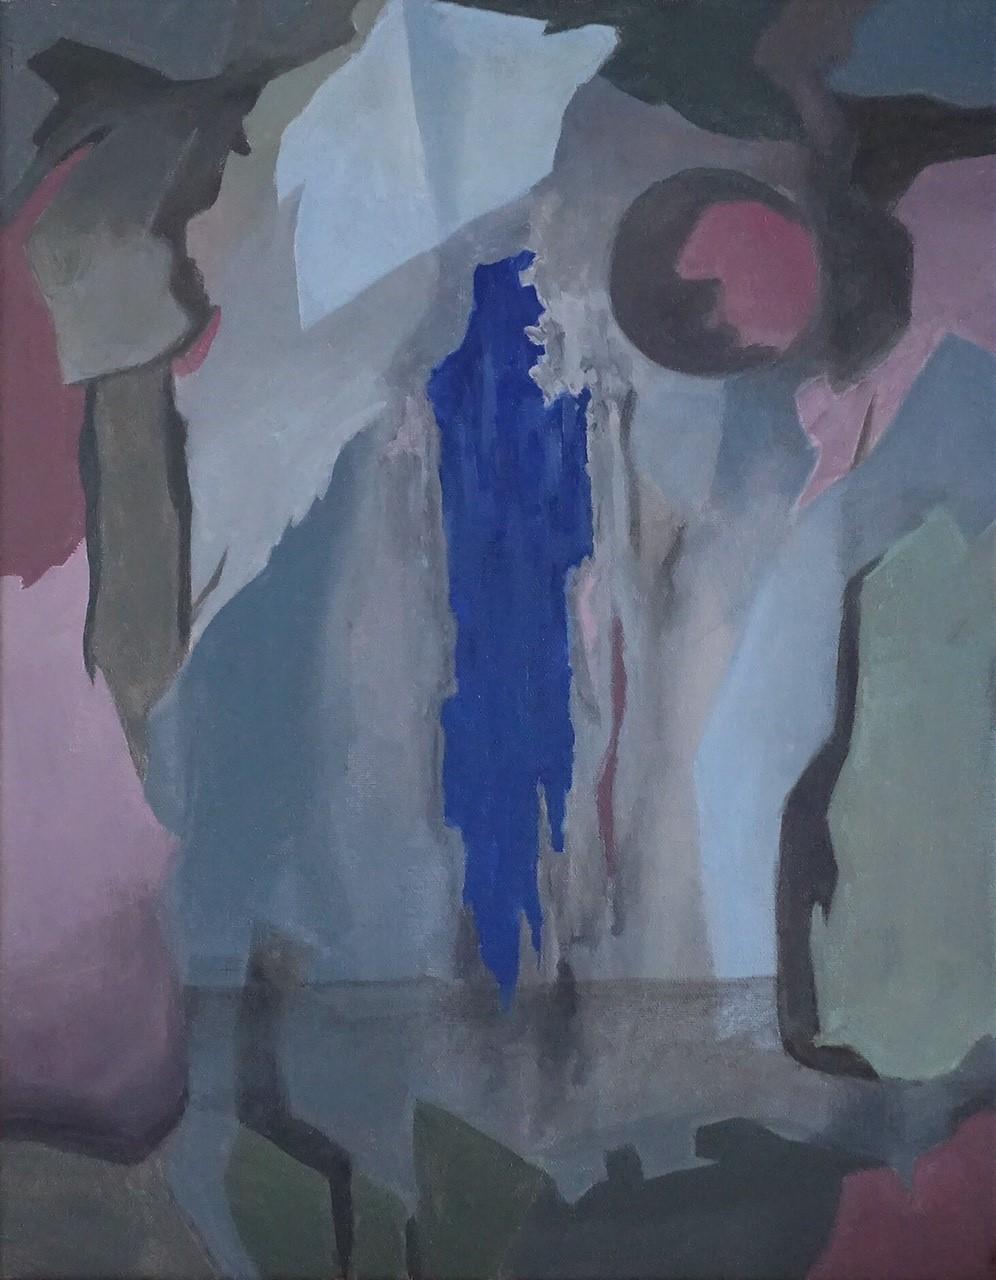 Untitled (Ultramarine), 2017